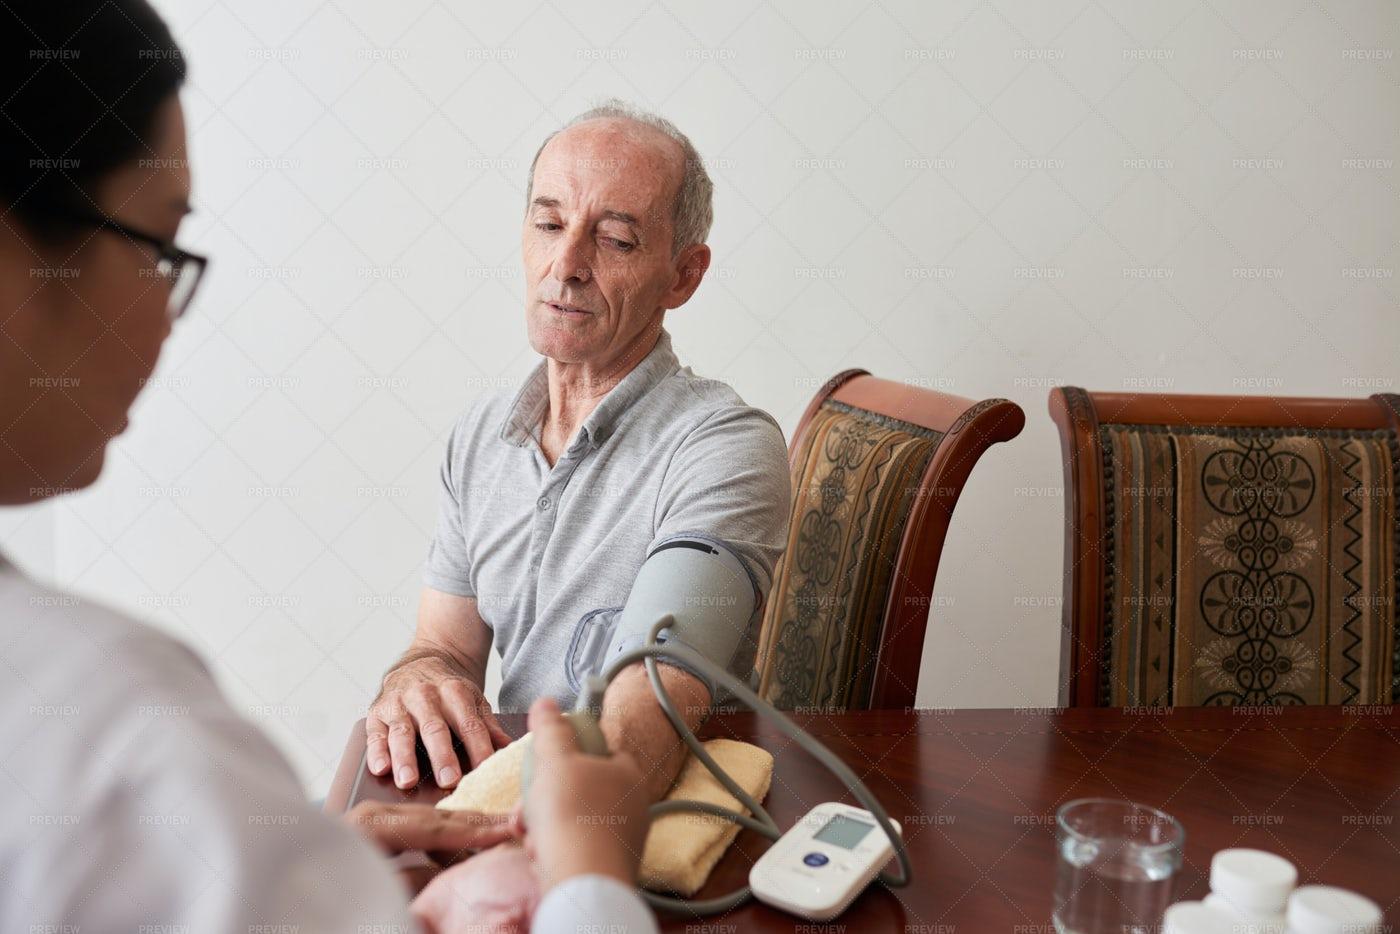 Measuring Blood Pressure: Stock Photos